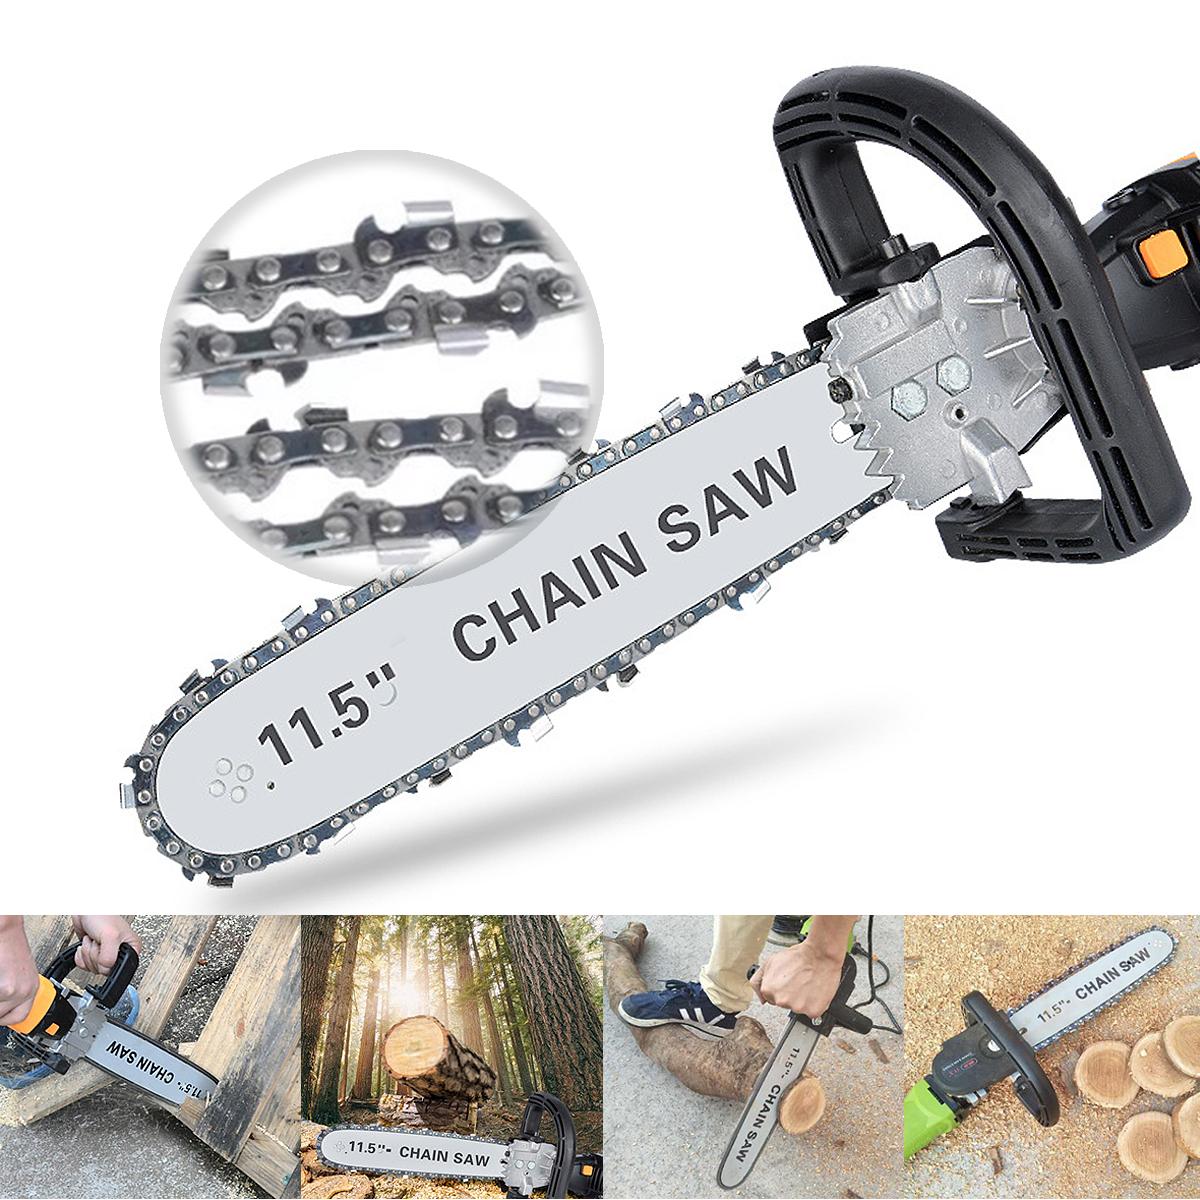 220V 650W Electric Chain Saw Angle Grinder Chain Saw Bracket Set Chainsaw Bracket Woodworking Tool